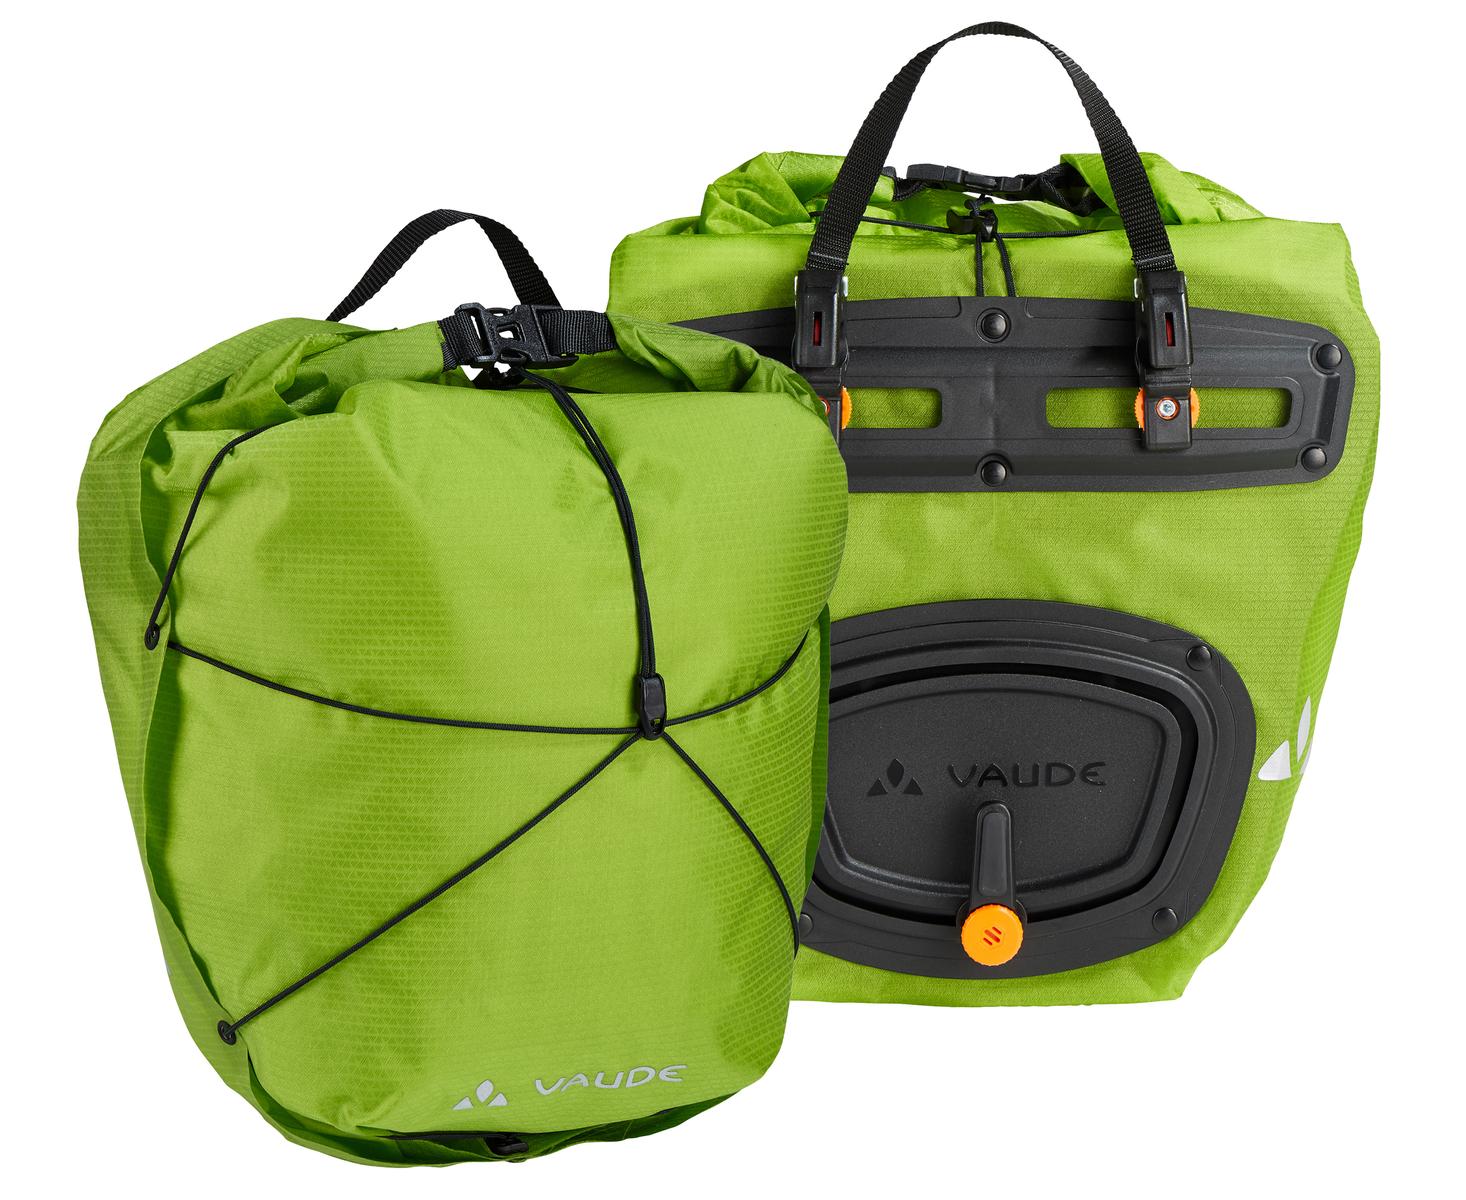 VAUDE Aqua Front Light chute green  - 2-Rad-Sport Wehrle